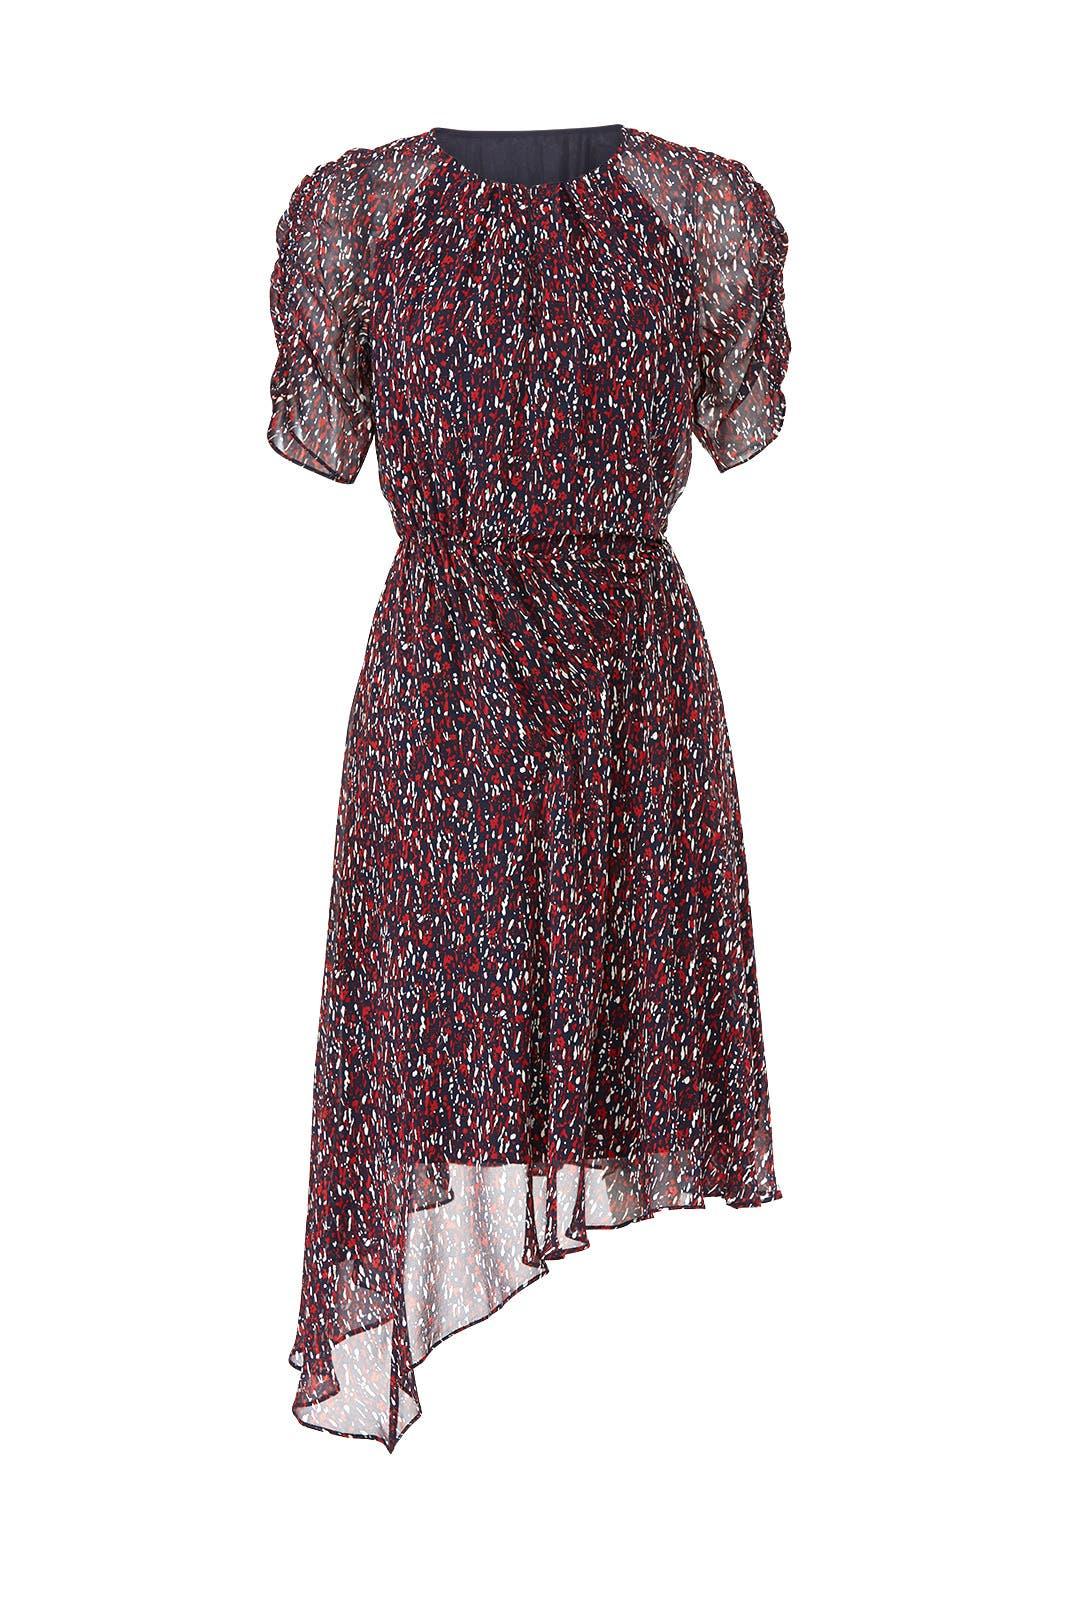 65e208cdb3a Nancilea Dress by Joie for  70